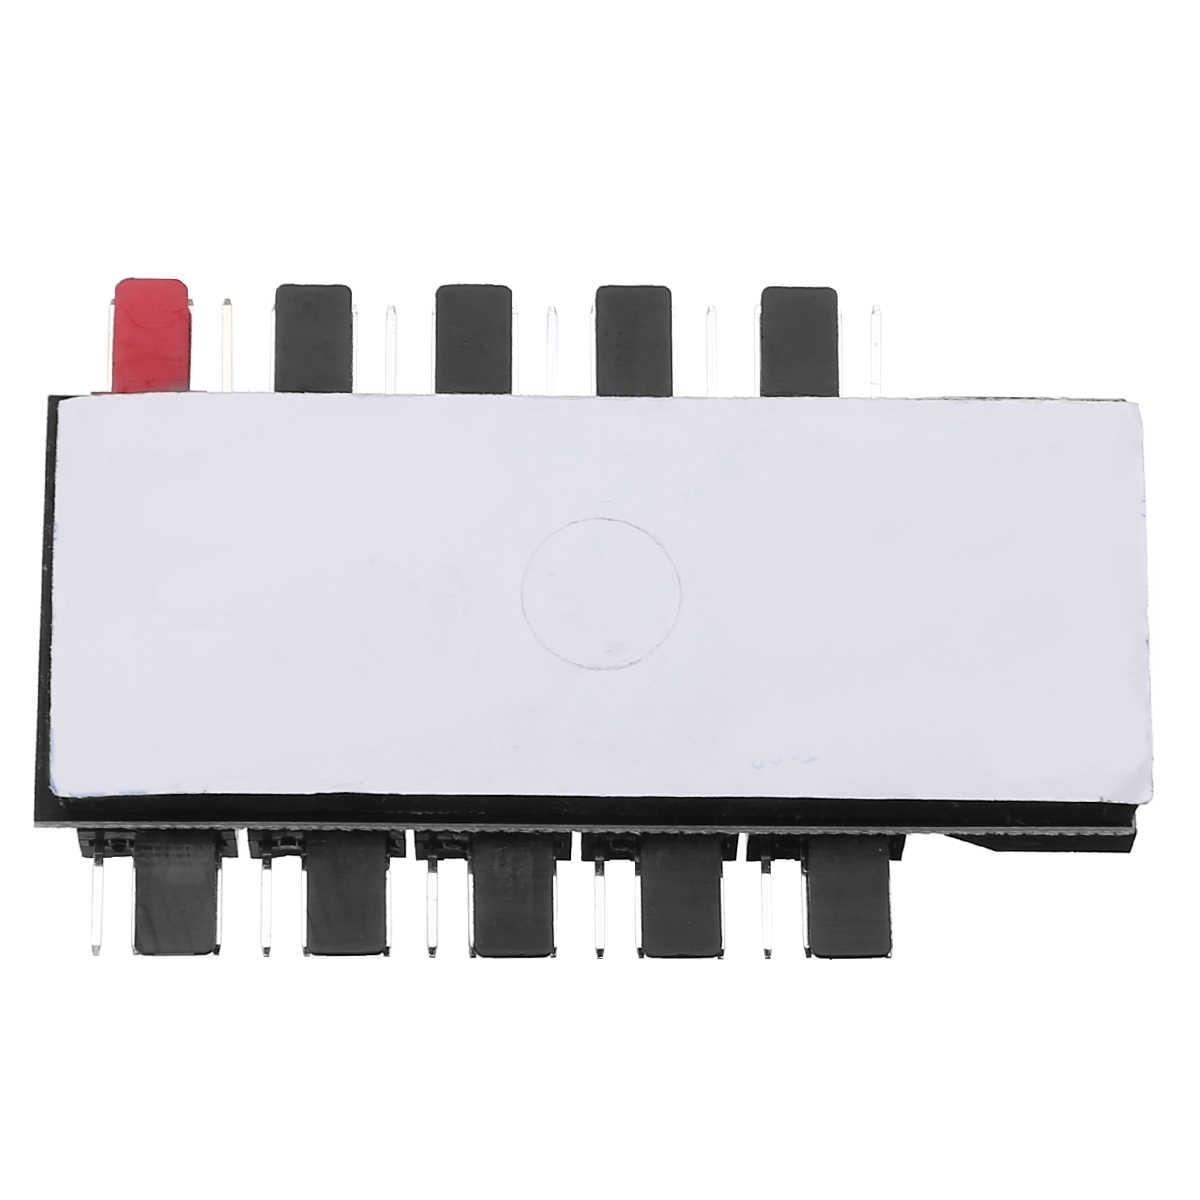 Pc 1 Sampai 10 4Pin Kipas Pendingin HUB Splitter Kabel 12V PWM LED Sata Power Suppply Adaptor Speed Controller untuk Komputer Pertambangan